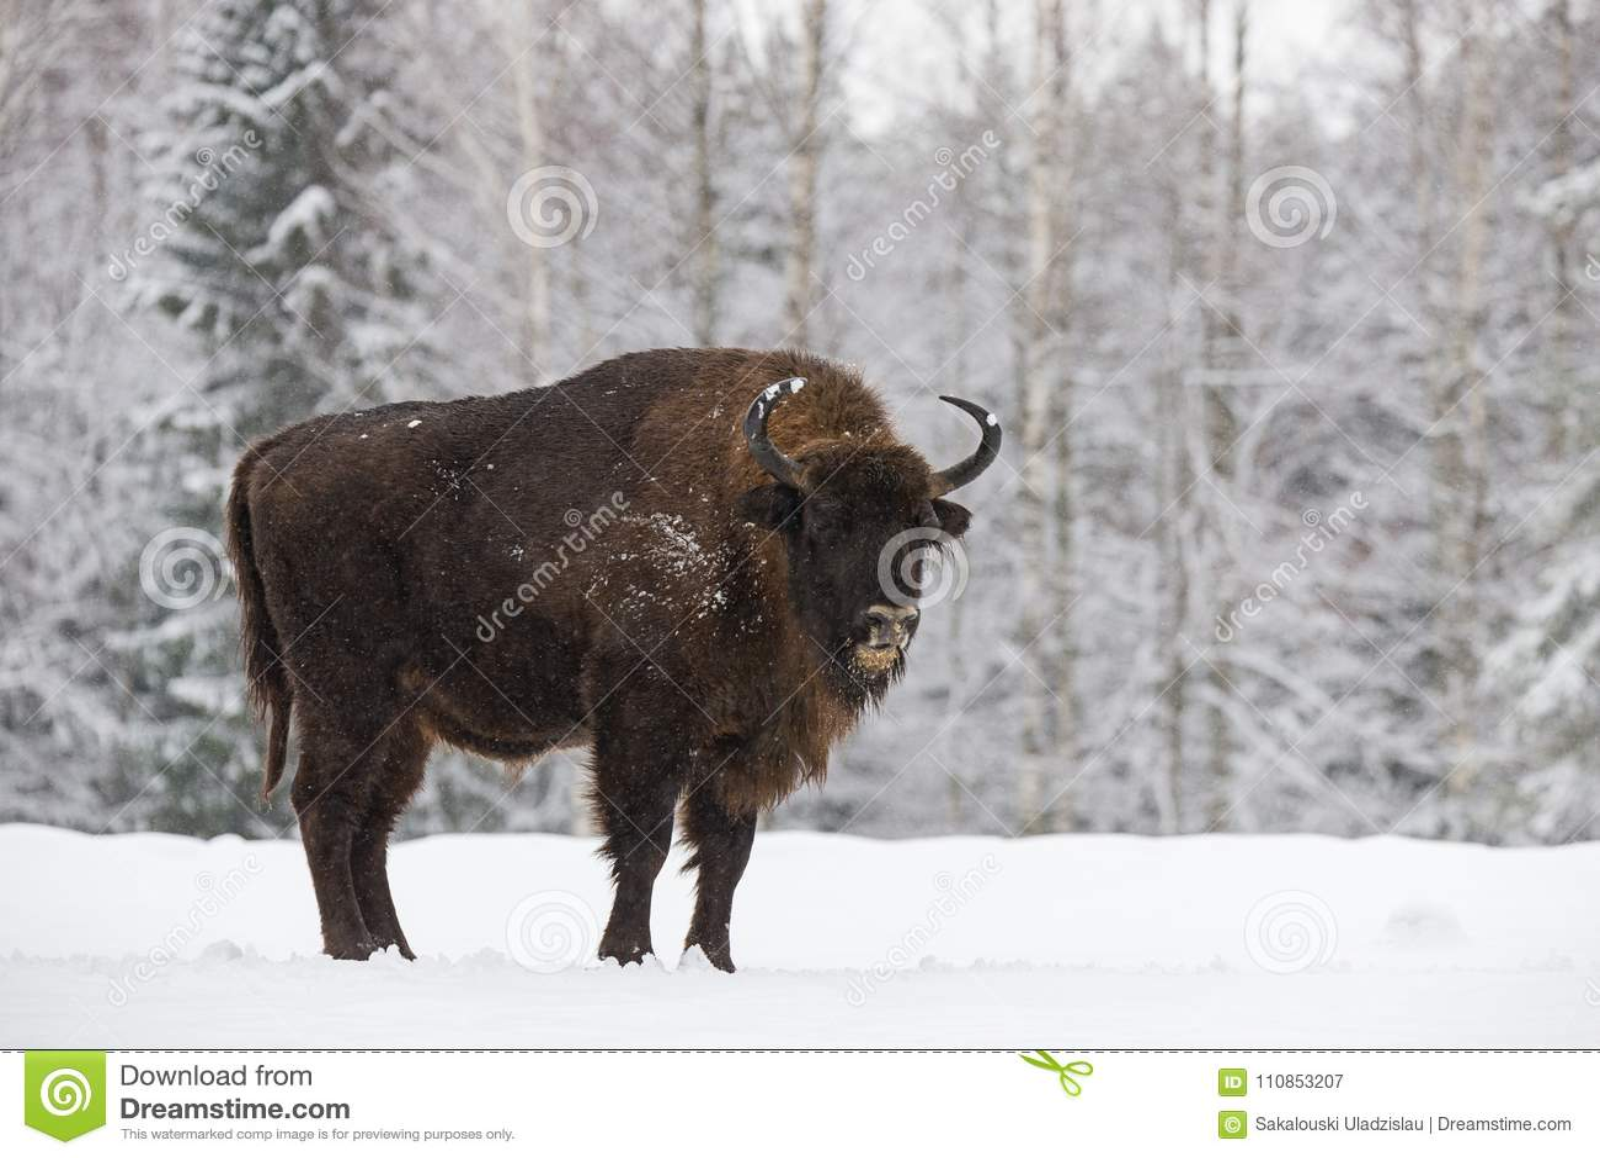 Bison On Field Wisent adulto poderoso majestoso no tempo de inverno, Bielorrússia do Aurochs Bisonte de madeira europeu selvagem,